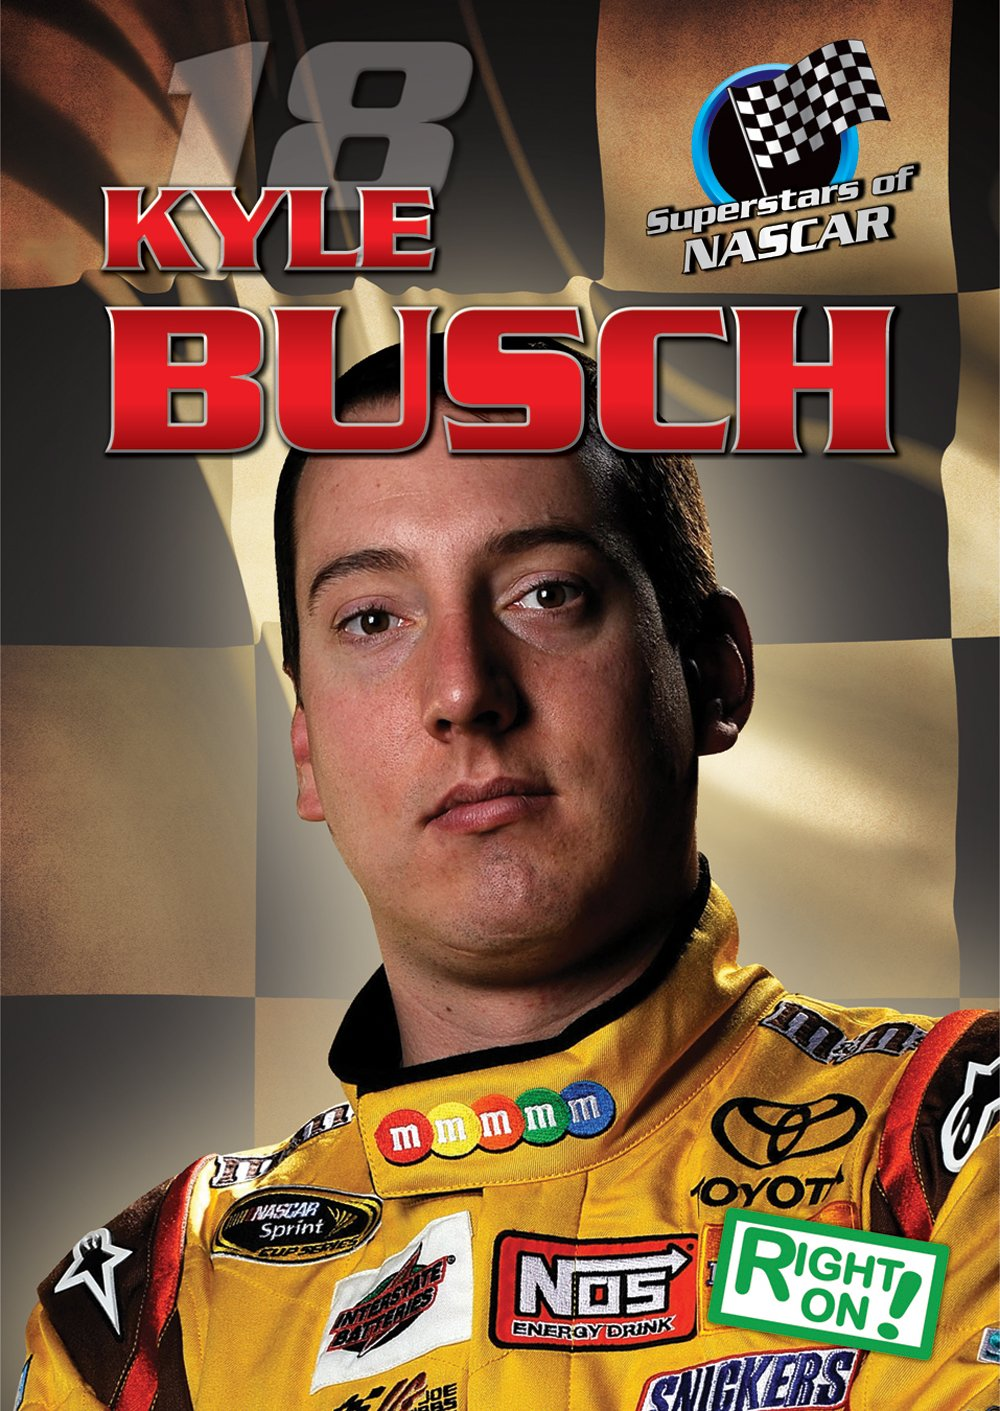 Kyle Busch (Superstars of NASCAR) PDF